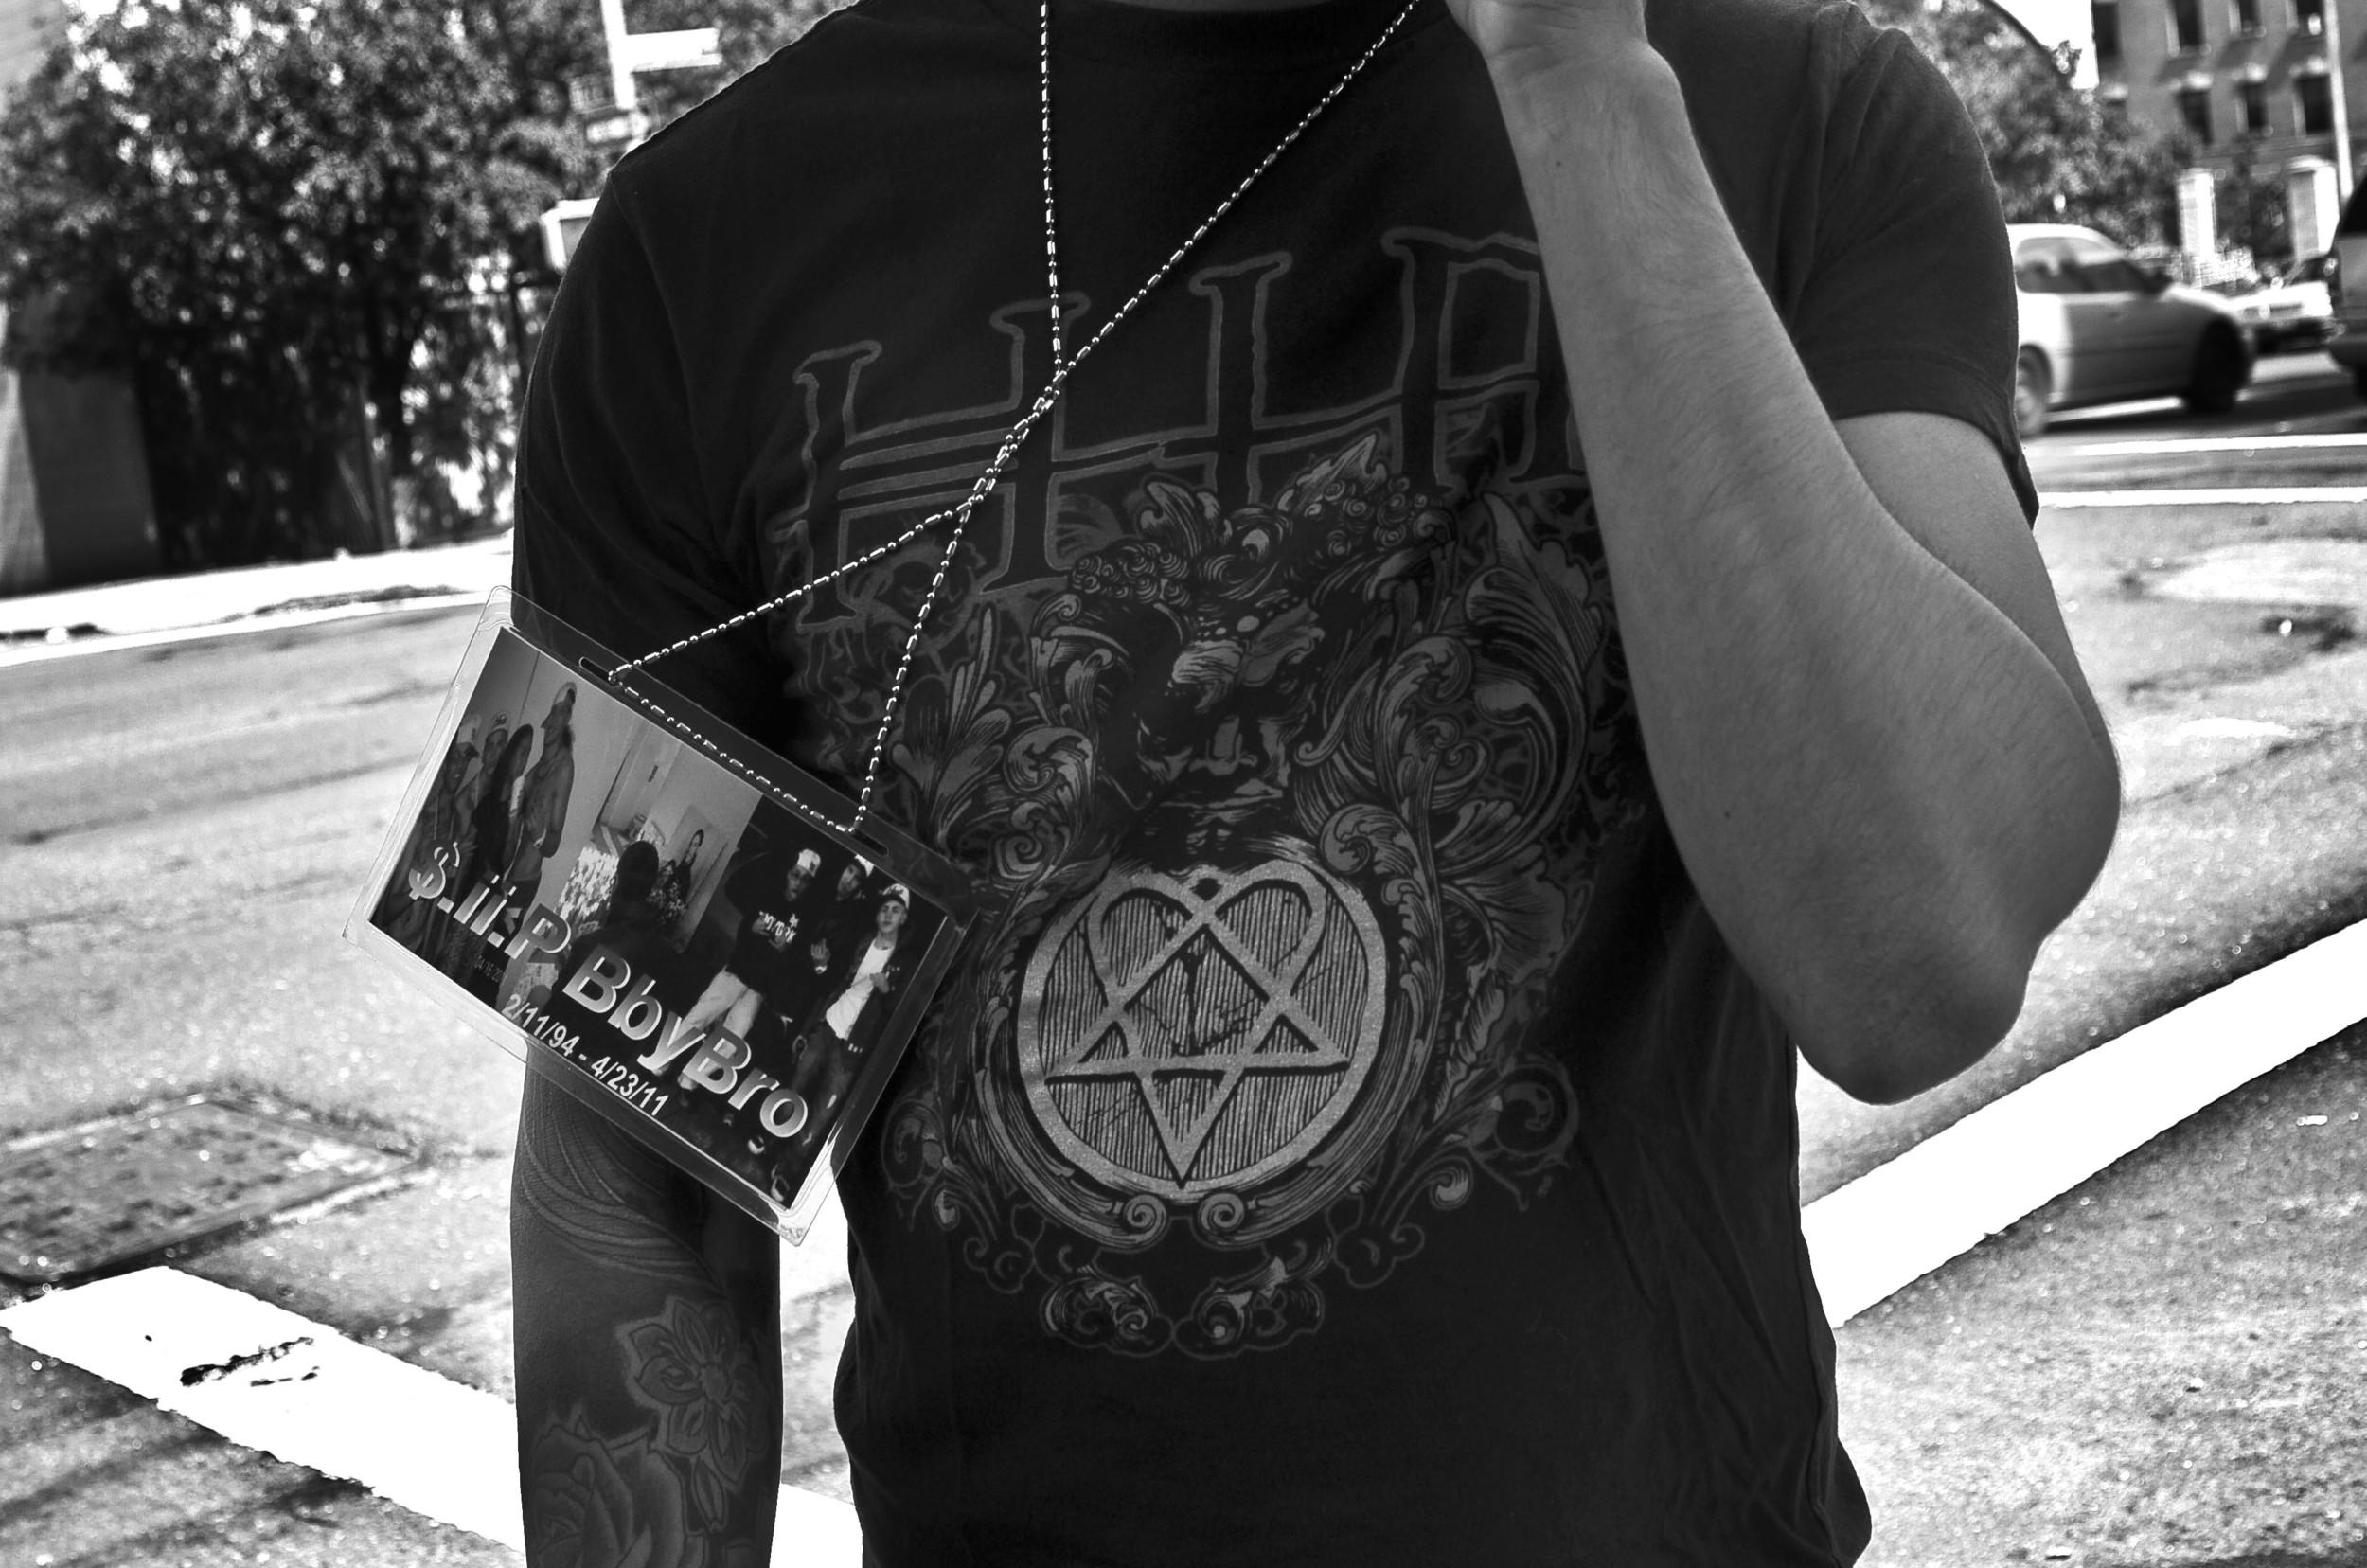 LOVE LIVES. RIP Medallion on Angel. Hunts Point, the Bronx, NYC. September 2012.